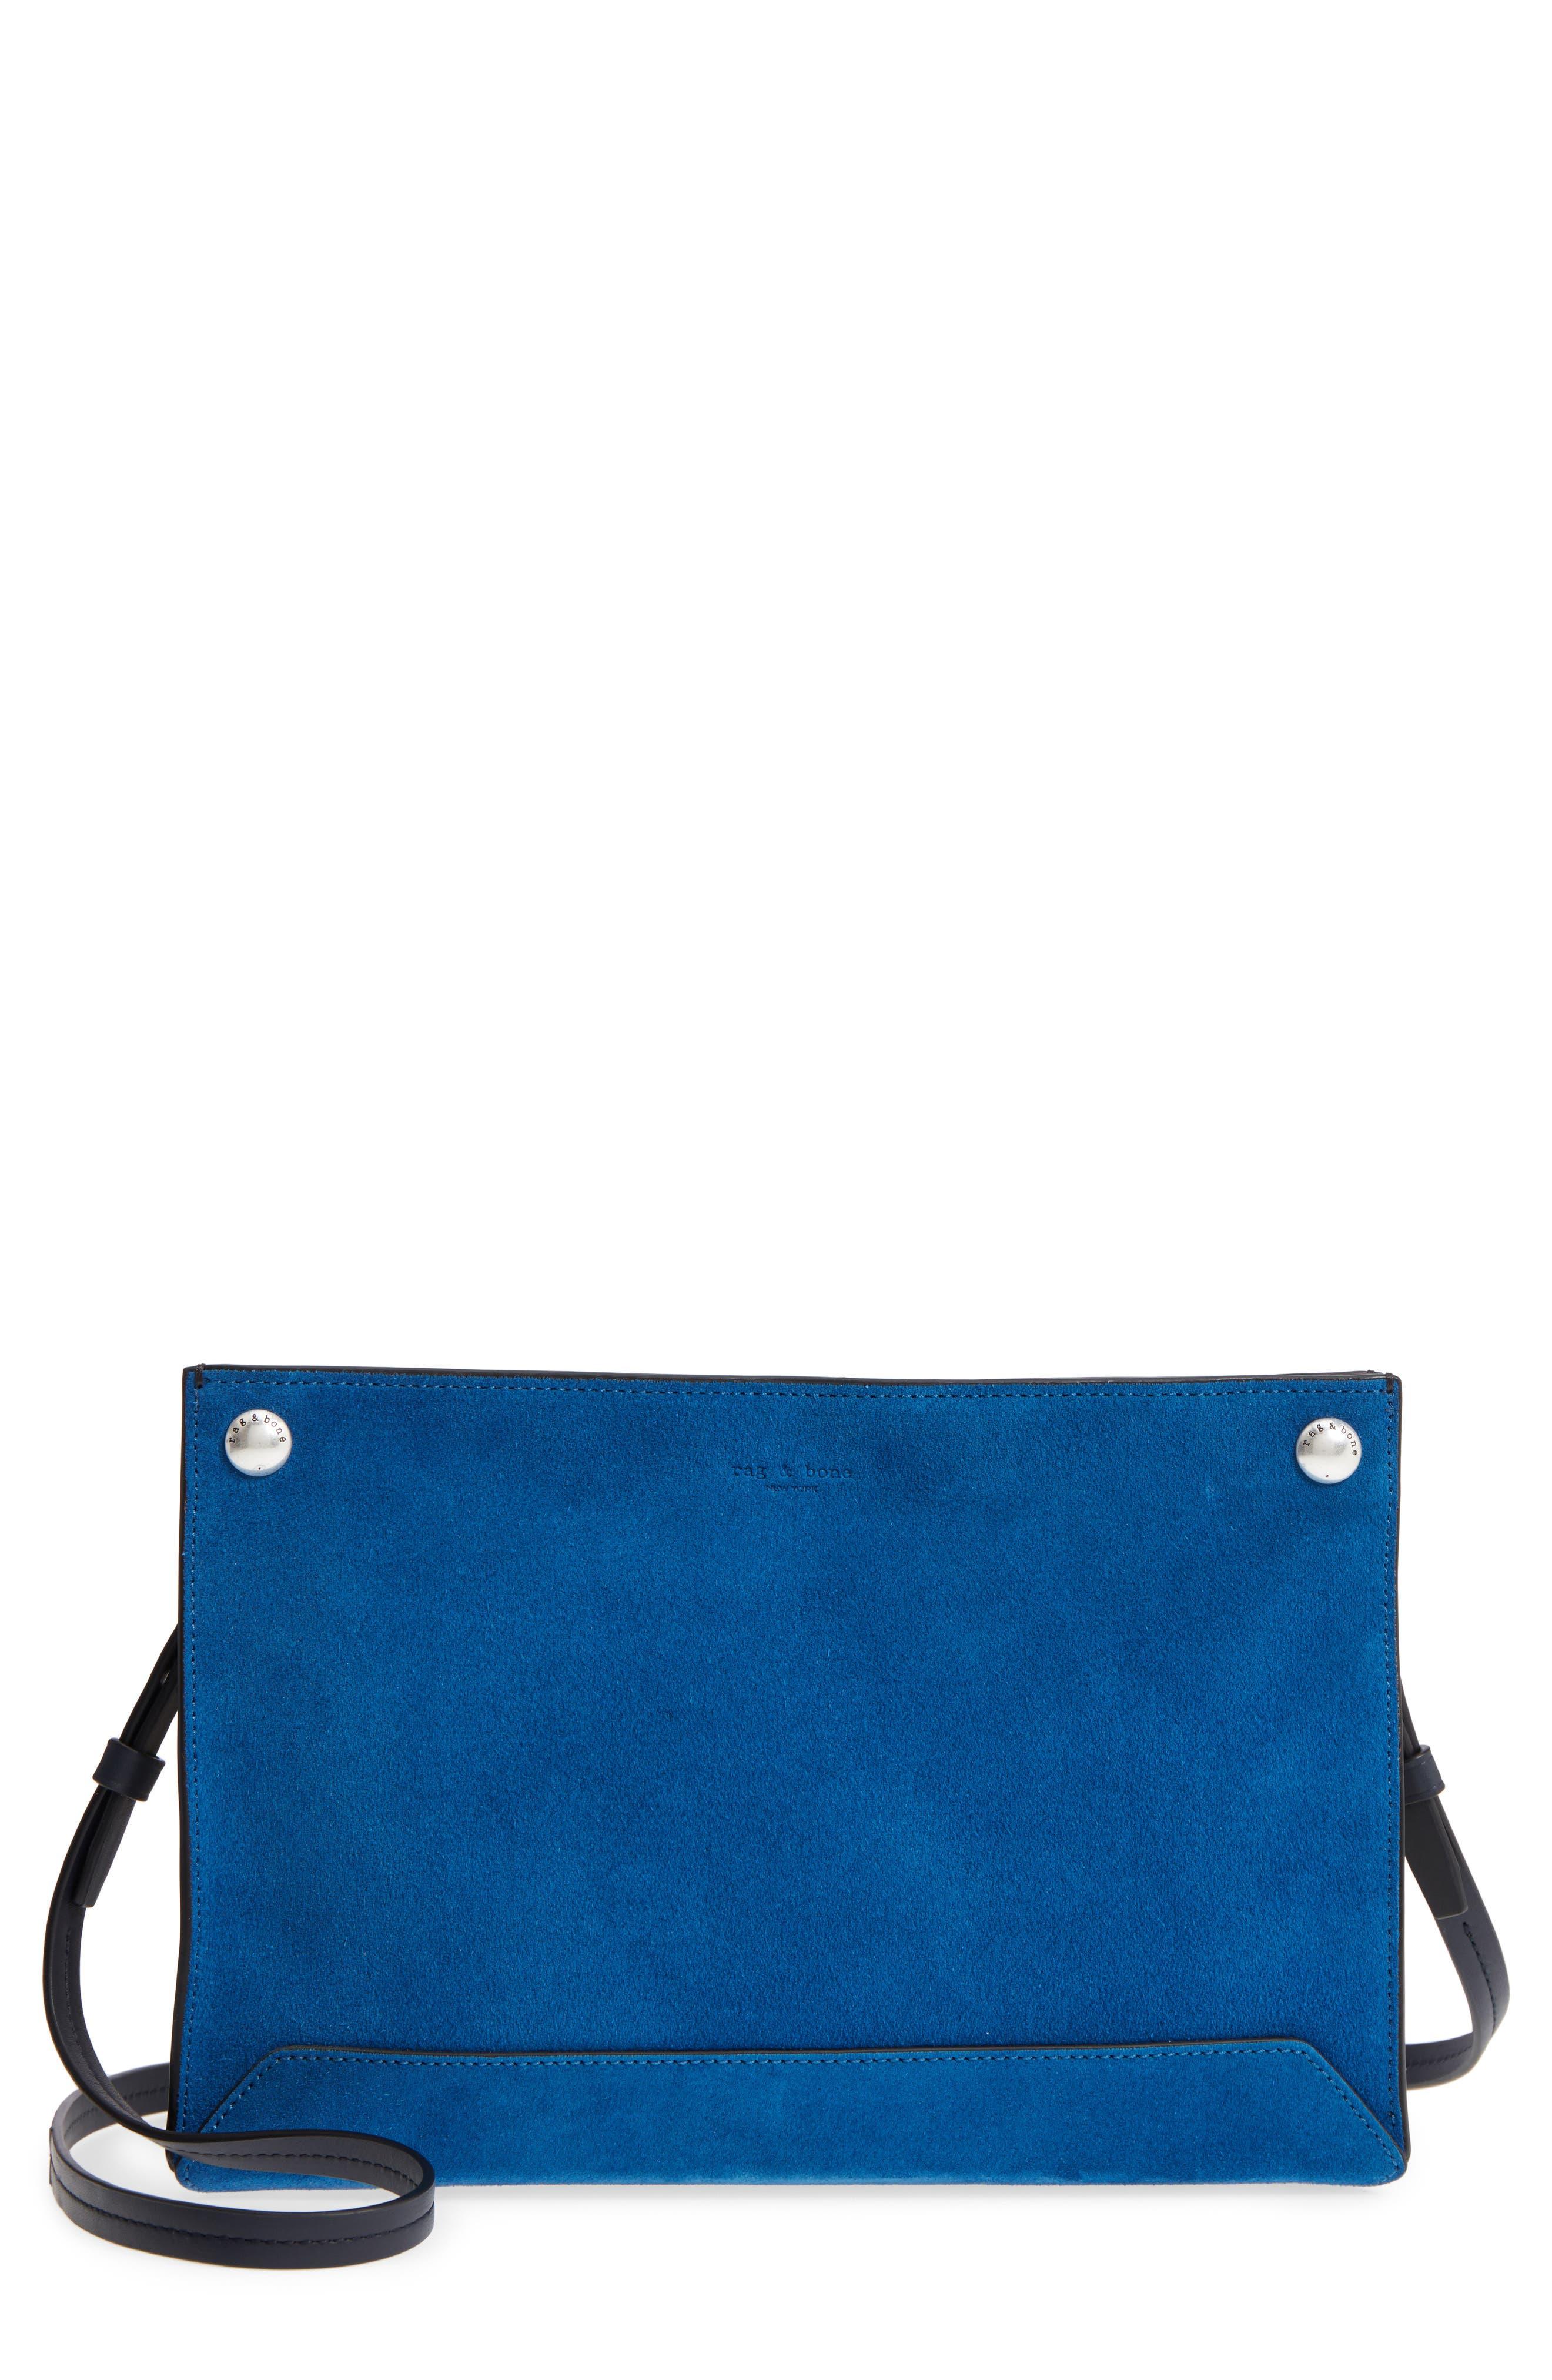 rag & bone Compass Colorblock Leather Crossbody Bag